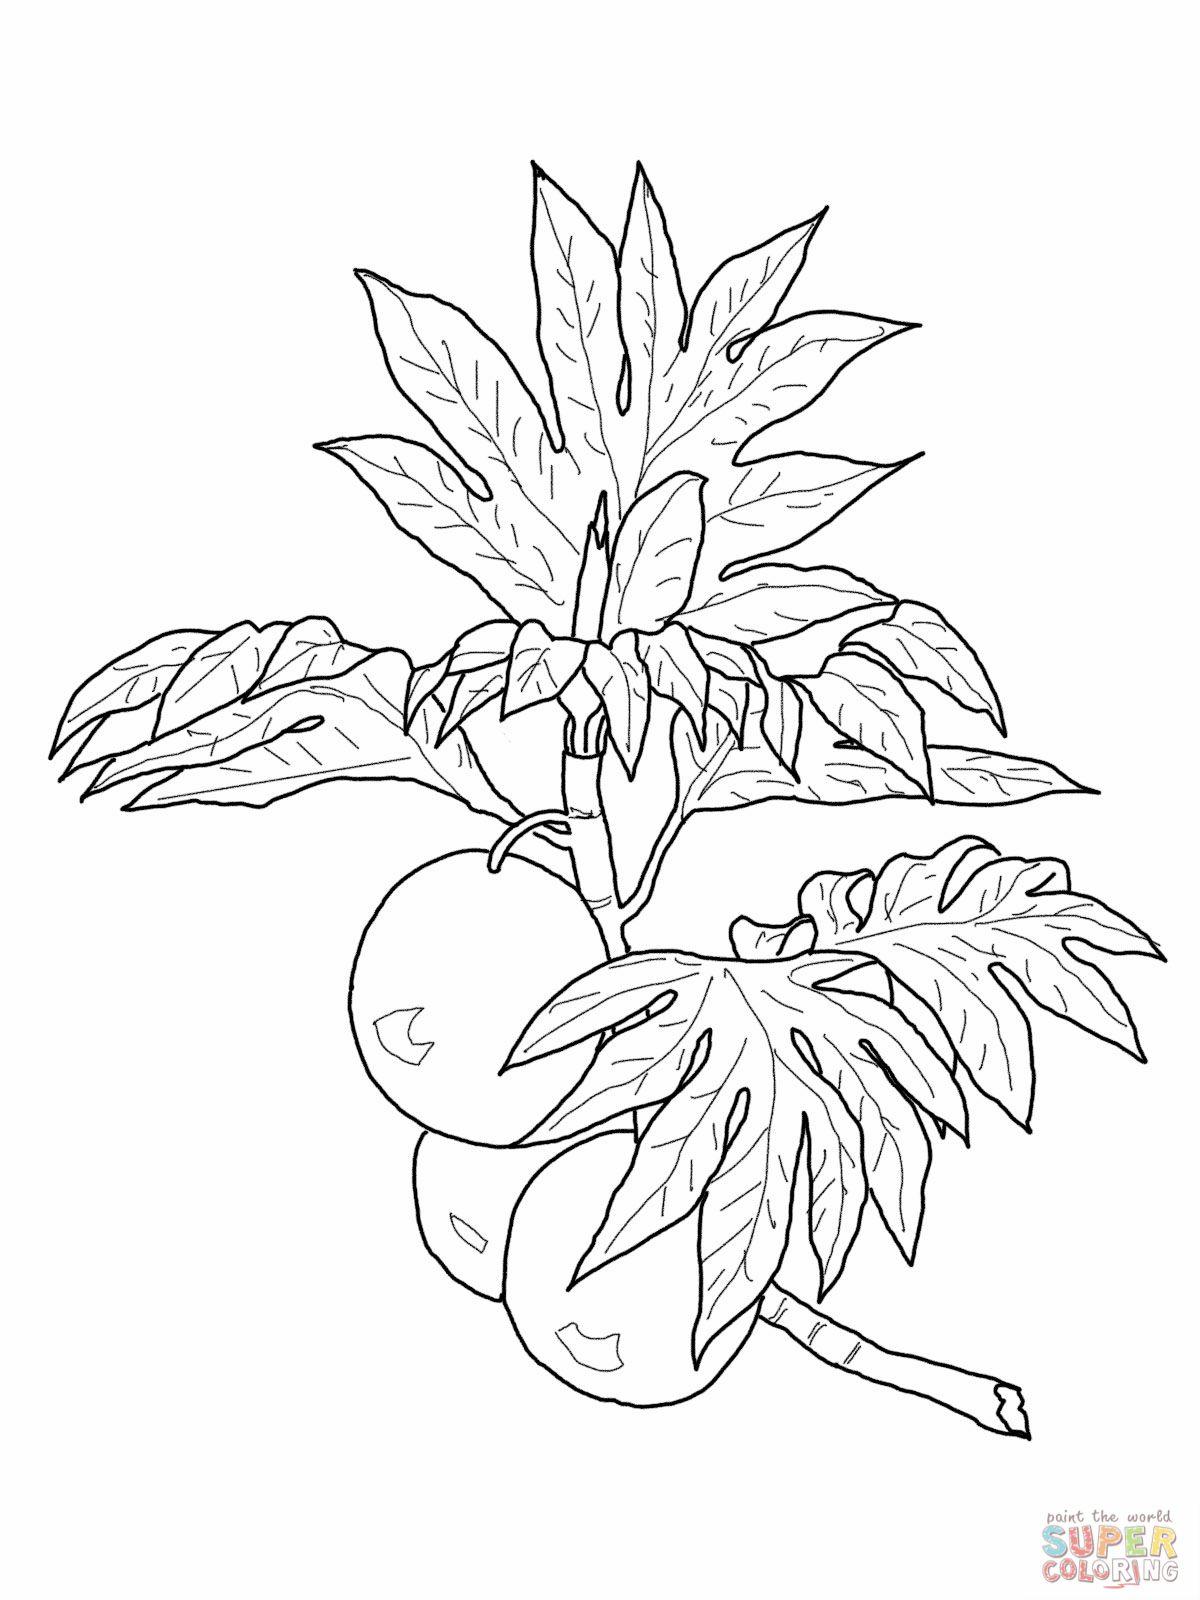 Ulu Breadfruit